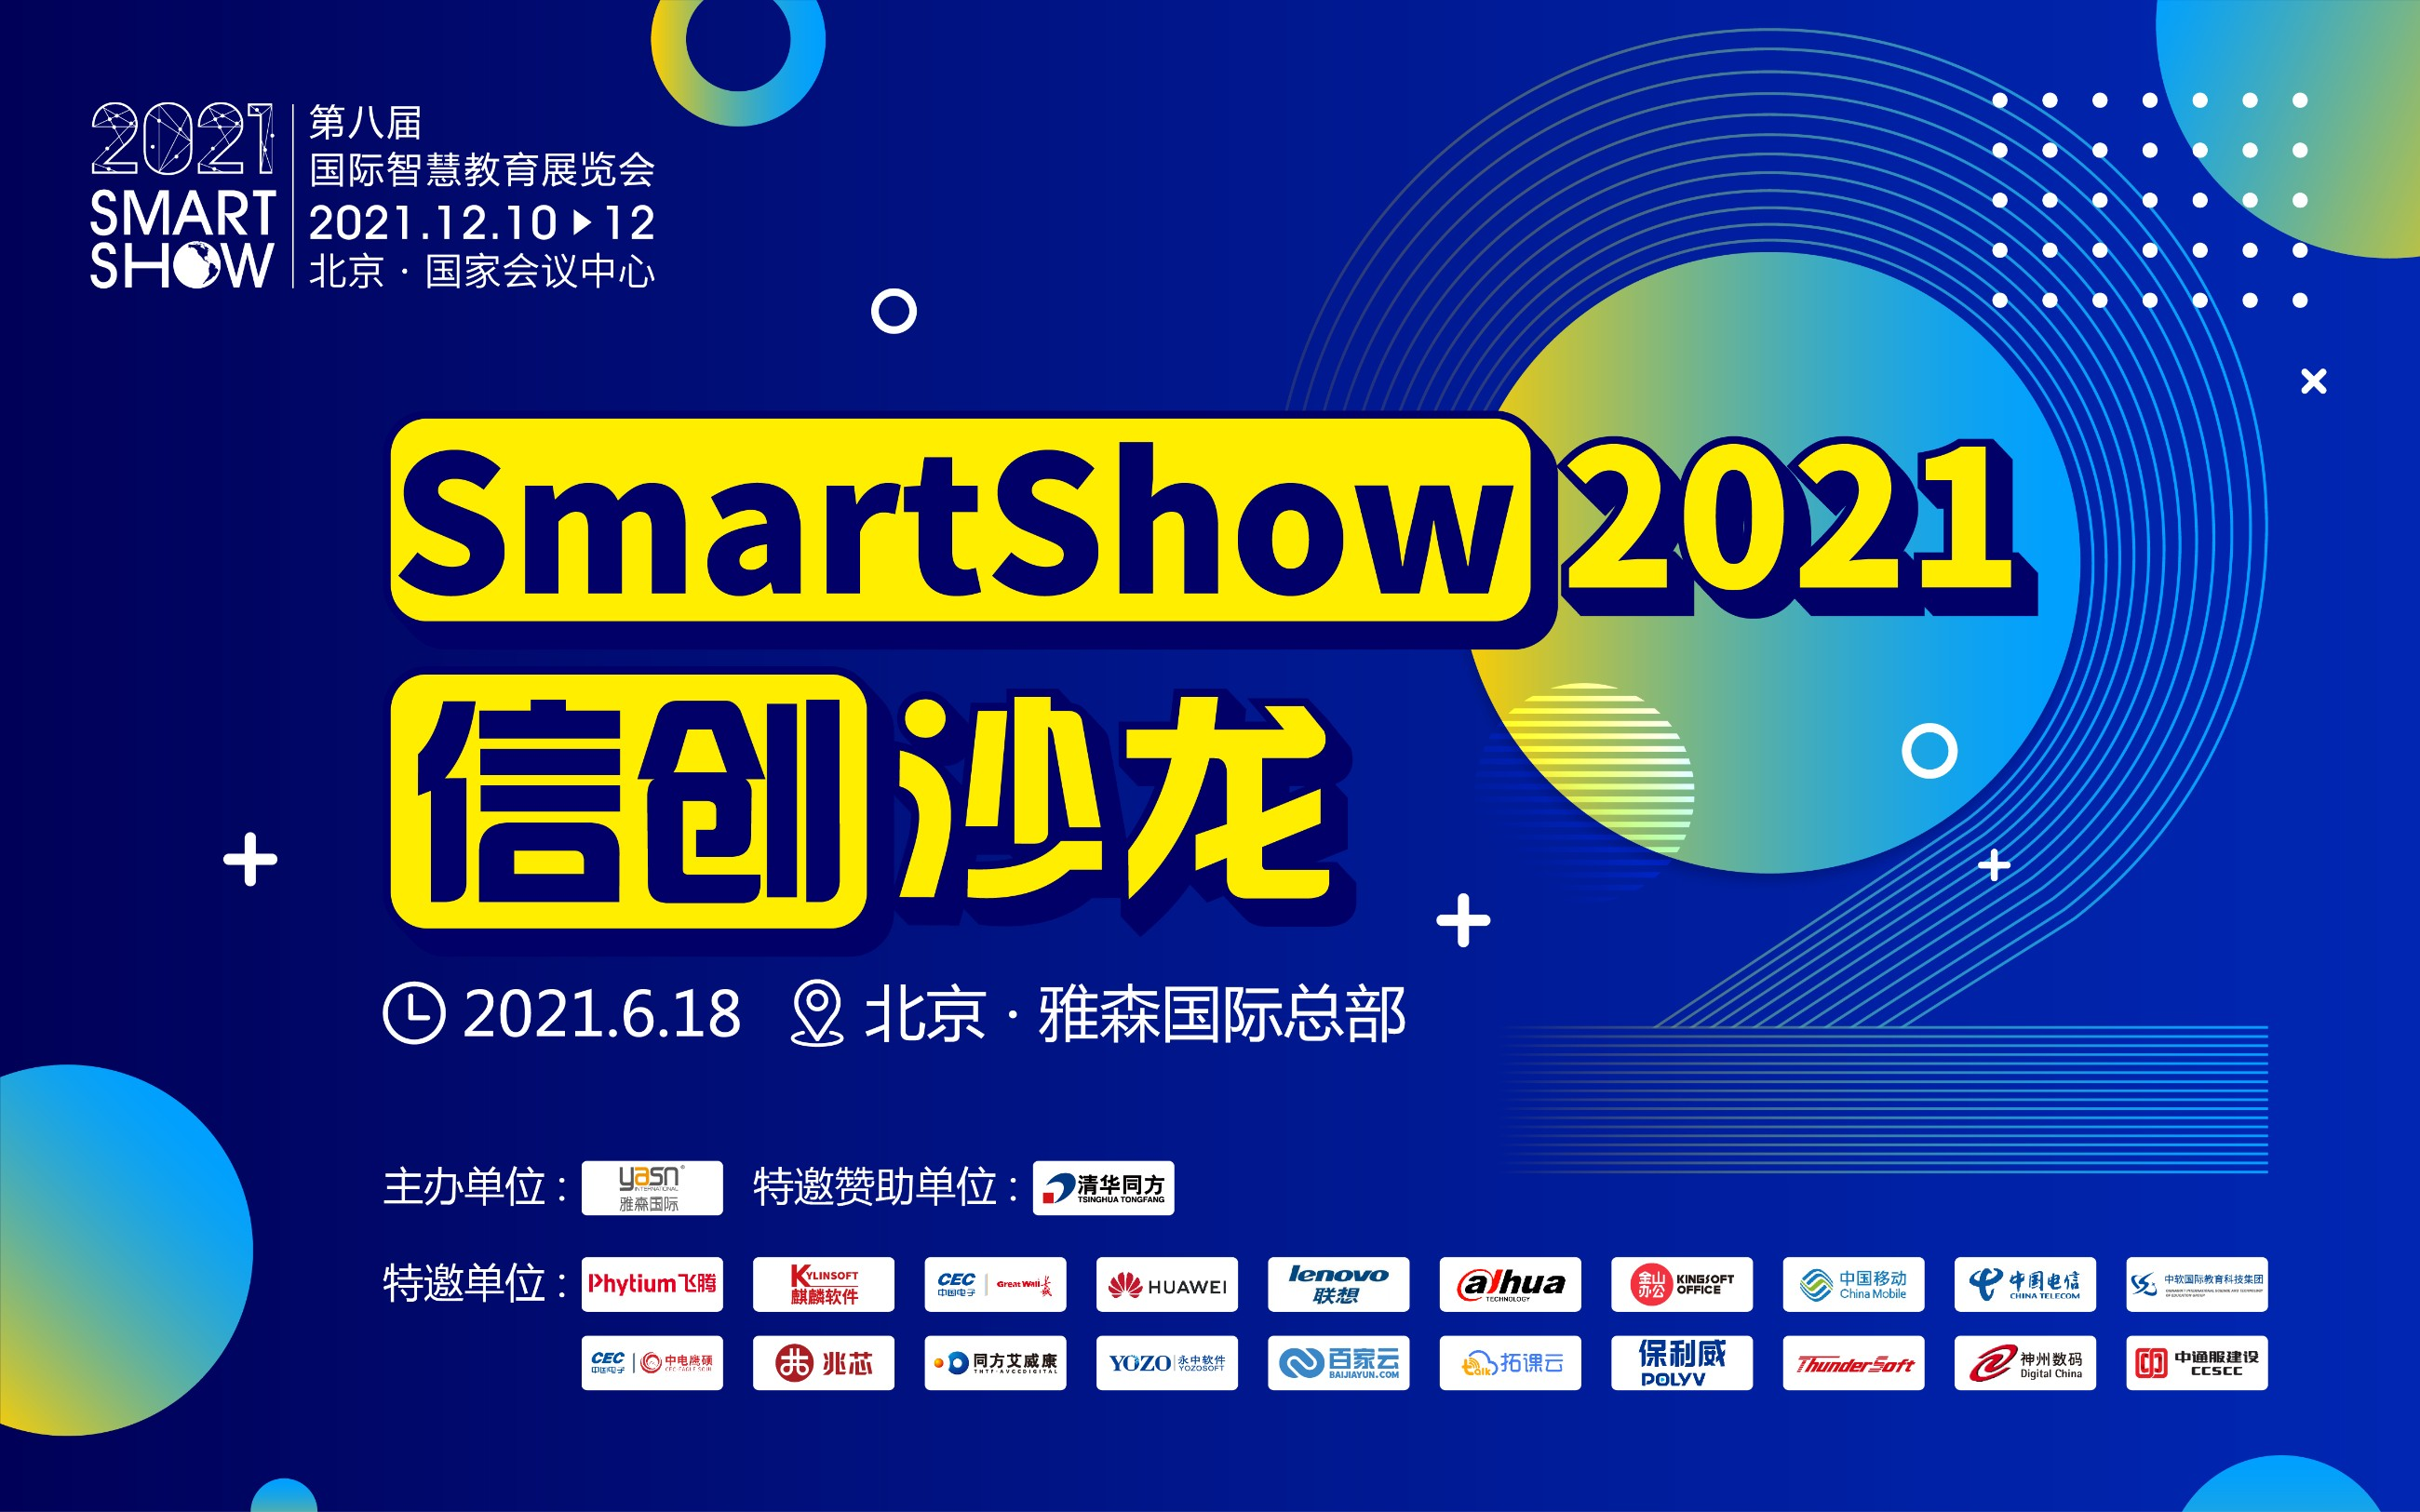 SmartShow2021信创沙龙阳光分享会圆满召开